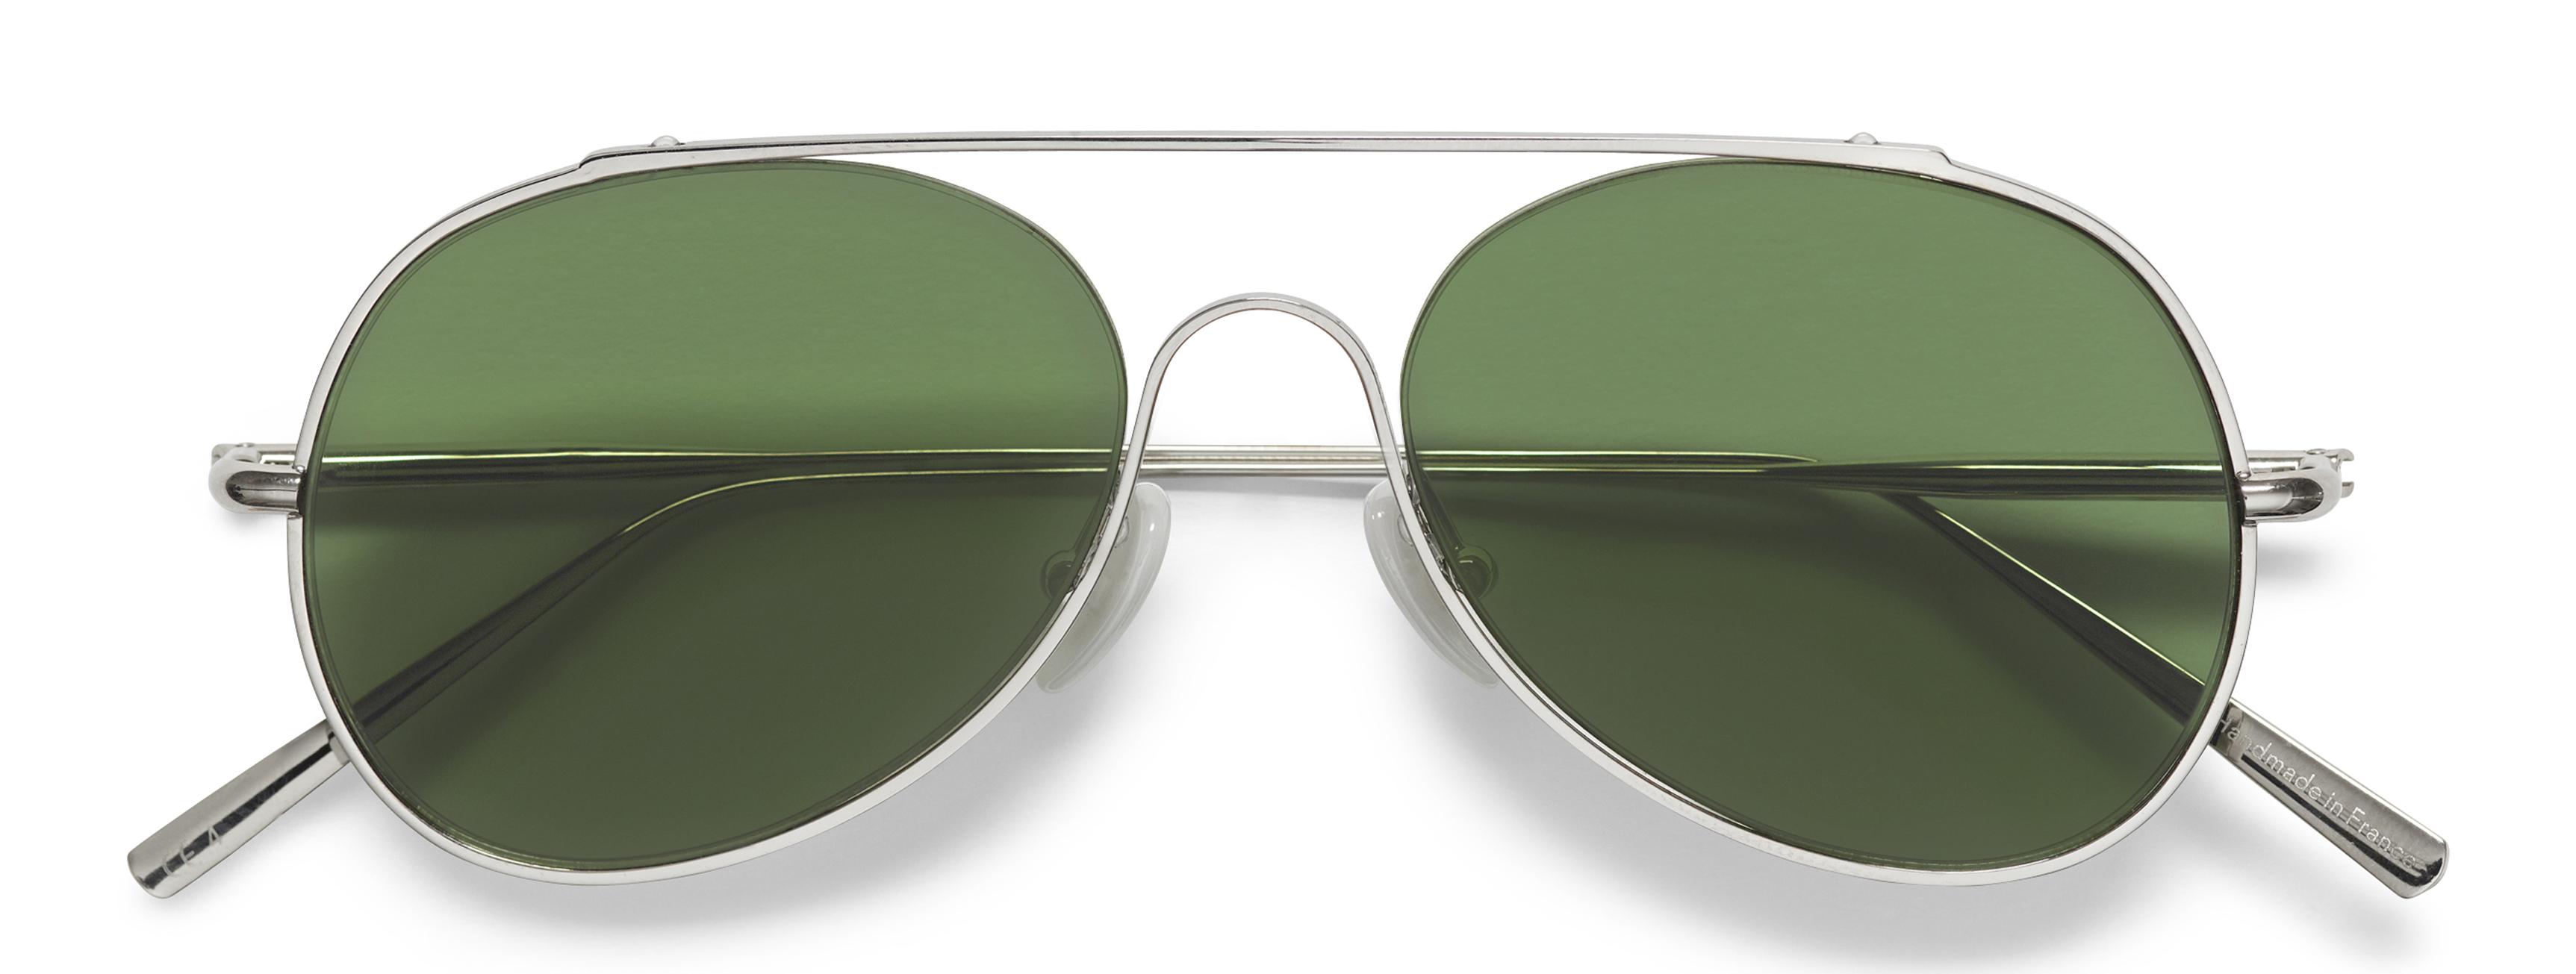 spitfire-small-palladium-green-1